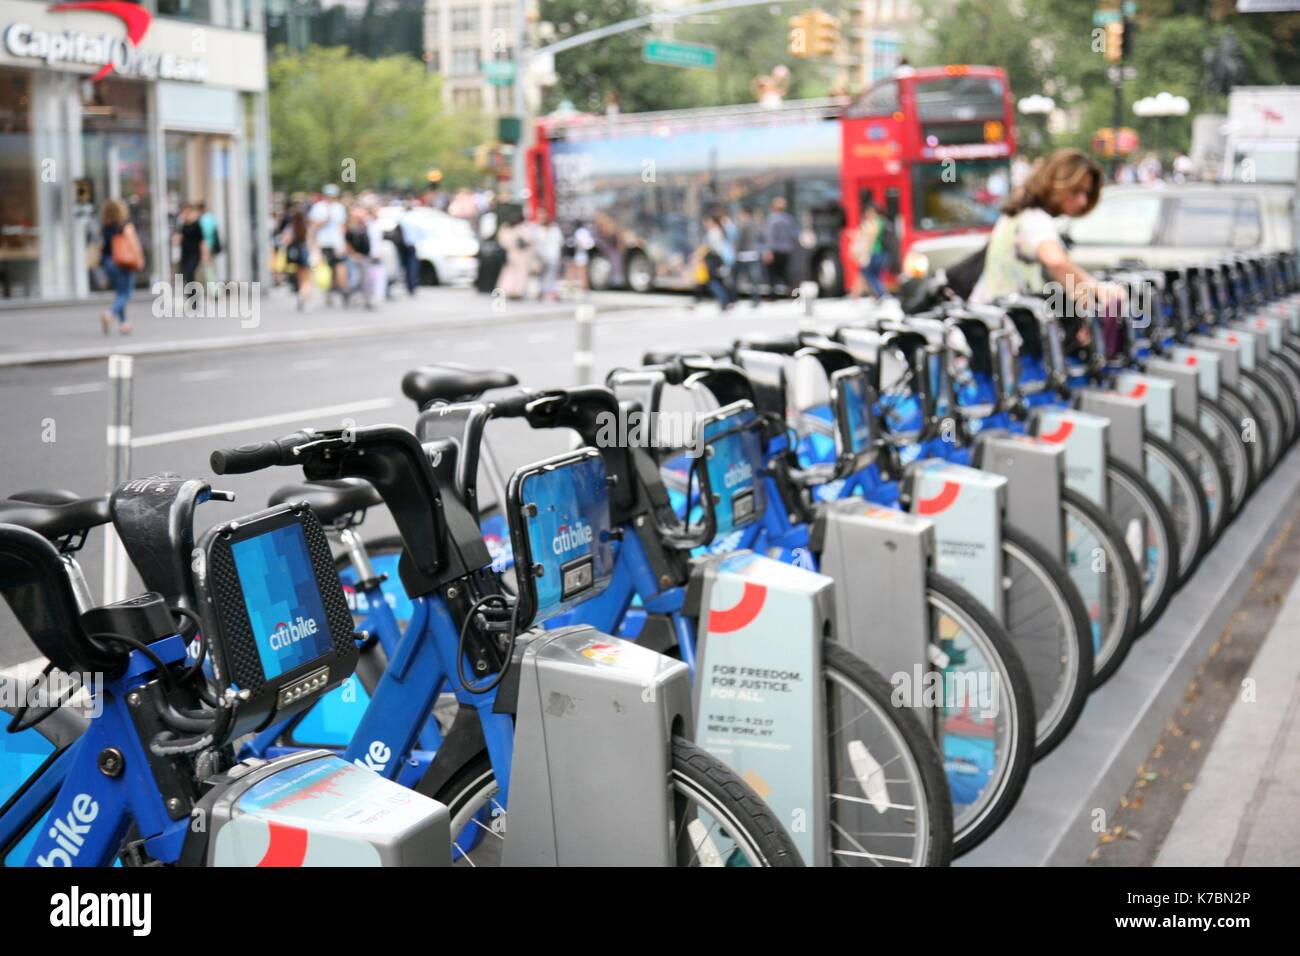 New York, US. 15th Feb, 2017. Citi Bike rental rack in New York City. © 2017 G. Ronald Lopez /DigiPixsAgain.us/Alamy Stock Photo